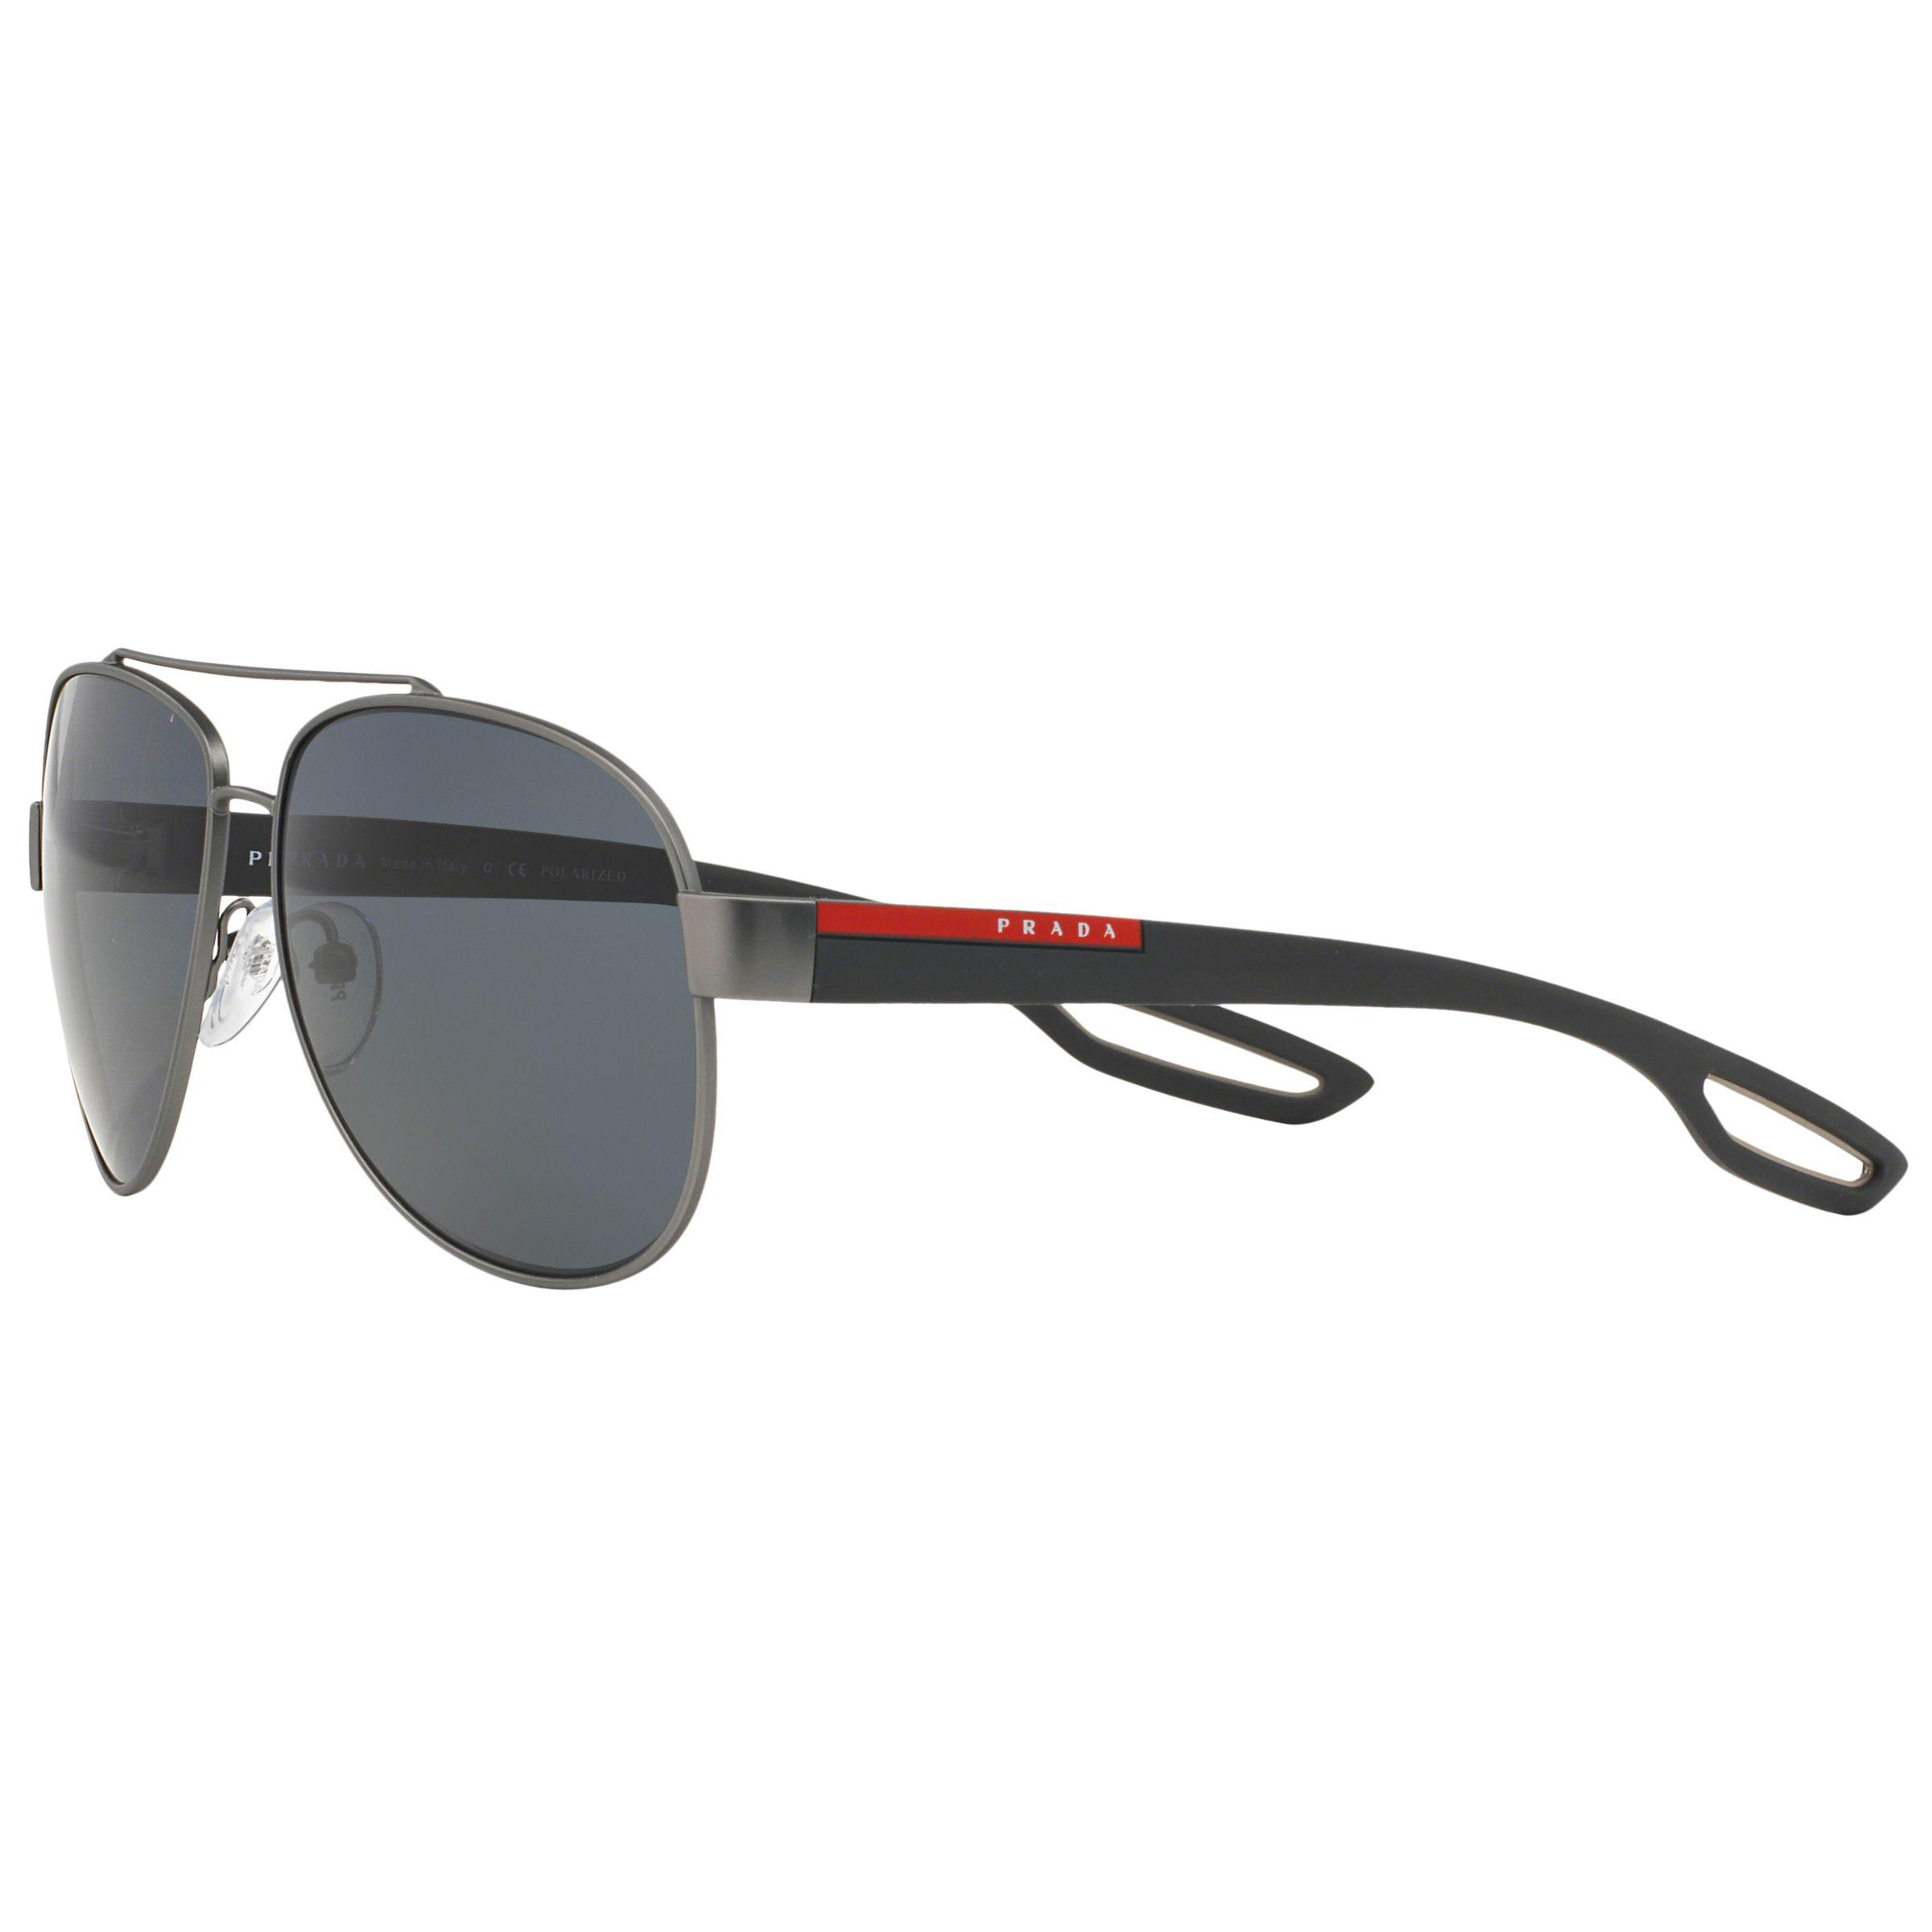 8307e6eb42c Prada - Gray Linea Rossa Ps55qs Aviator Polarised Sunglasses for Men -  Lyst. View fullscreen